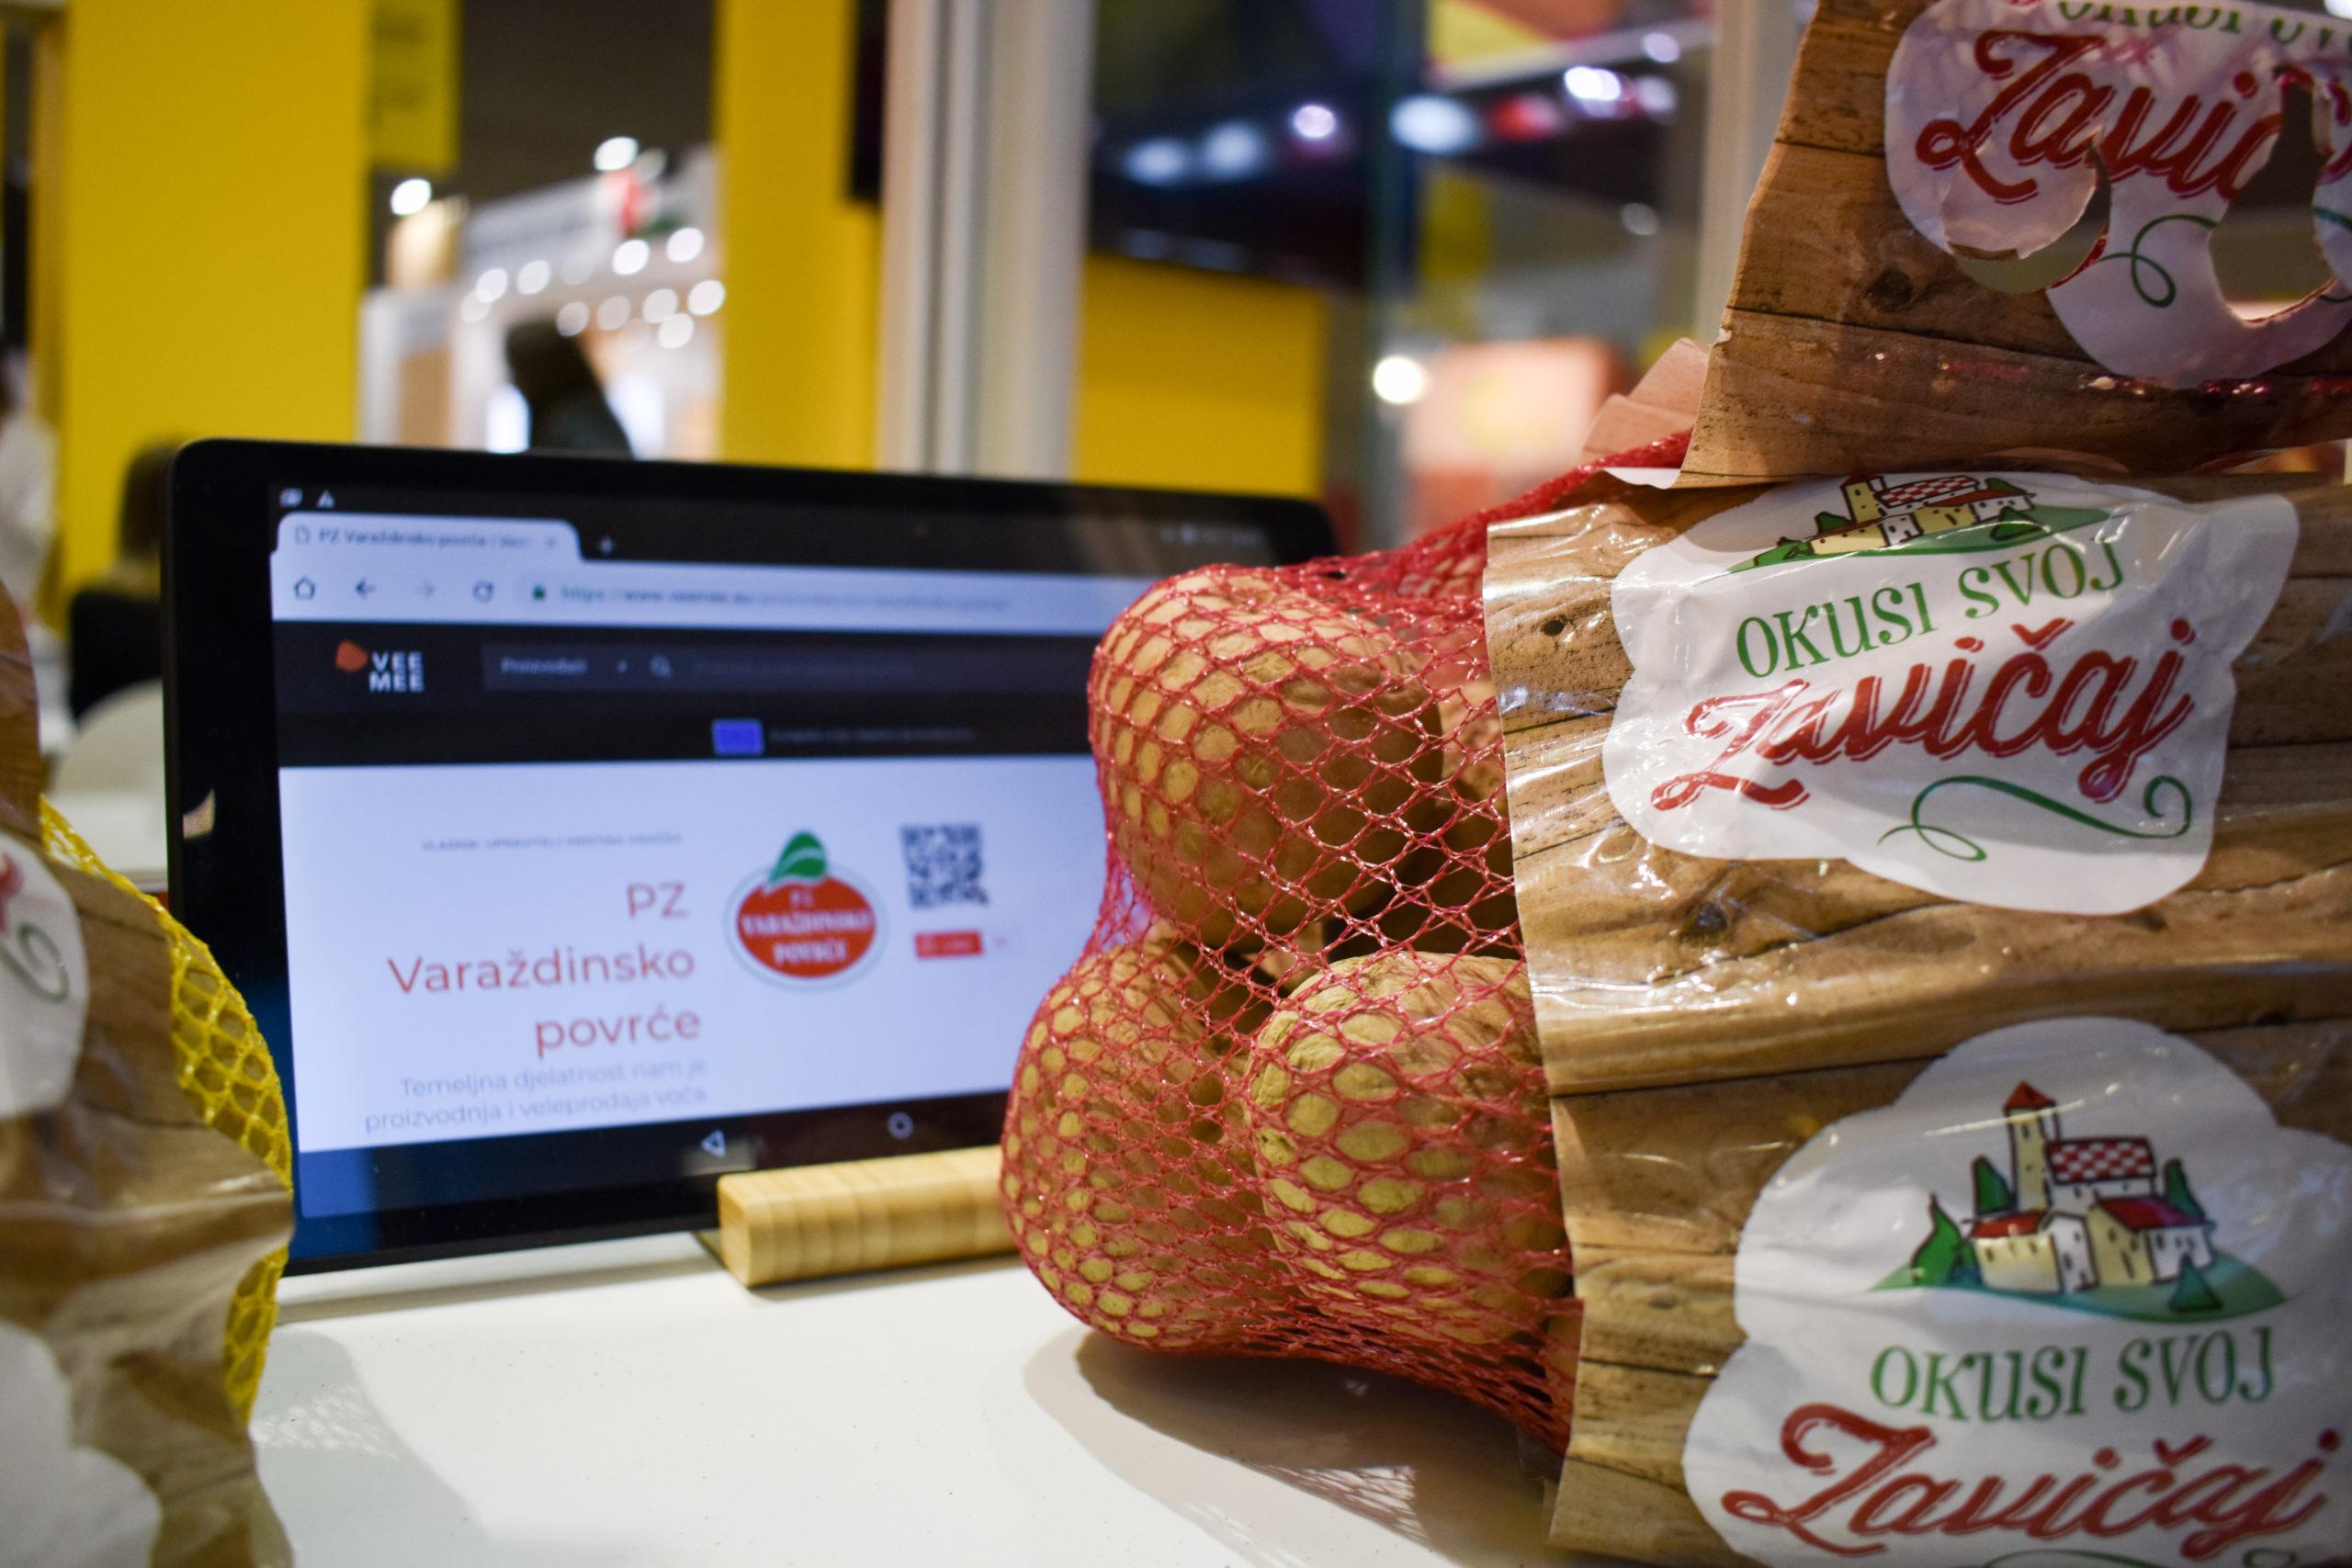 Fruit Logistica 2020. - PZ Varaždinsko povrće